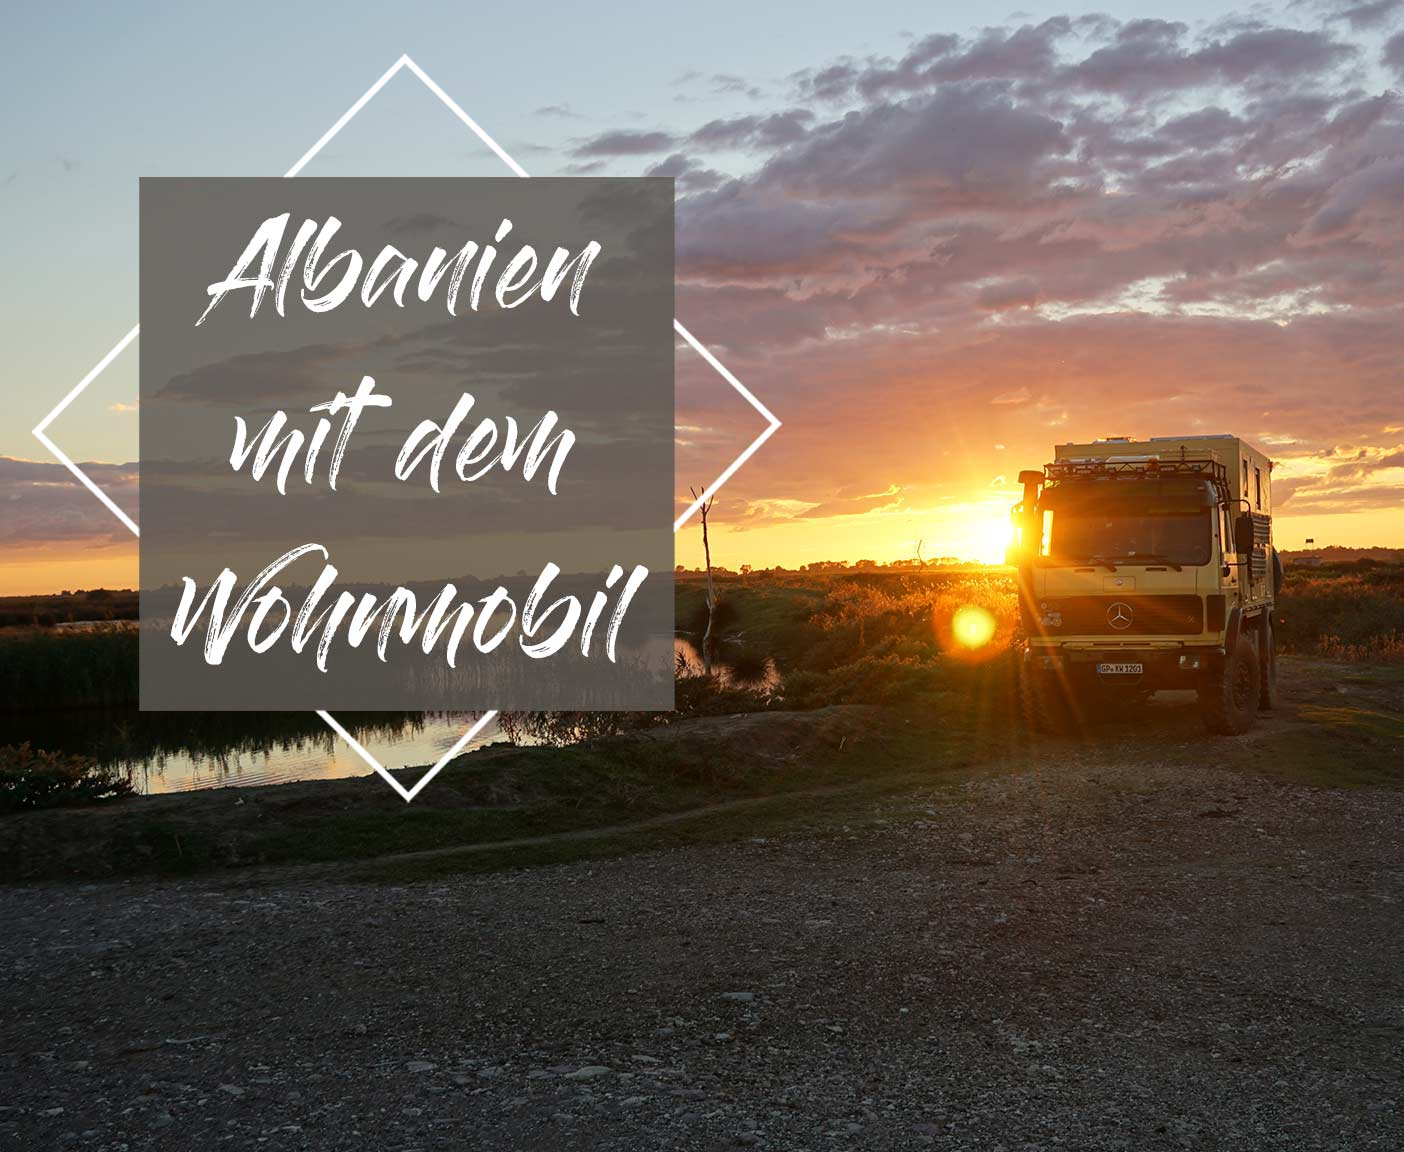 Albanien-wohnmobil-mieten-womo-titel-reisebericht-balkan